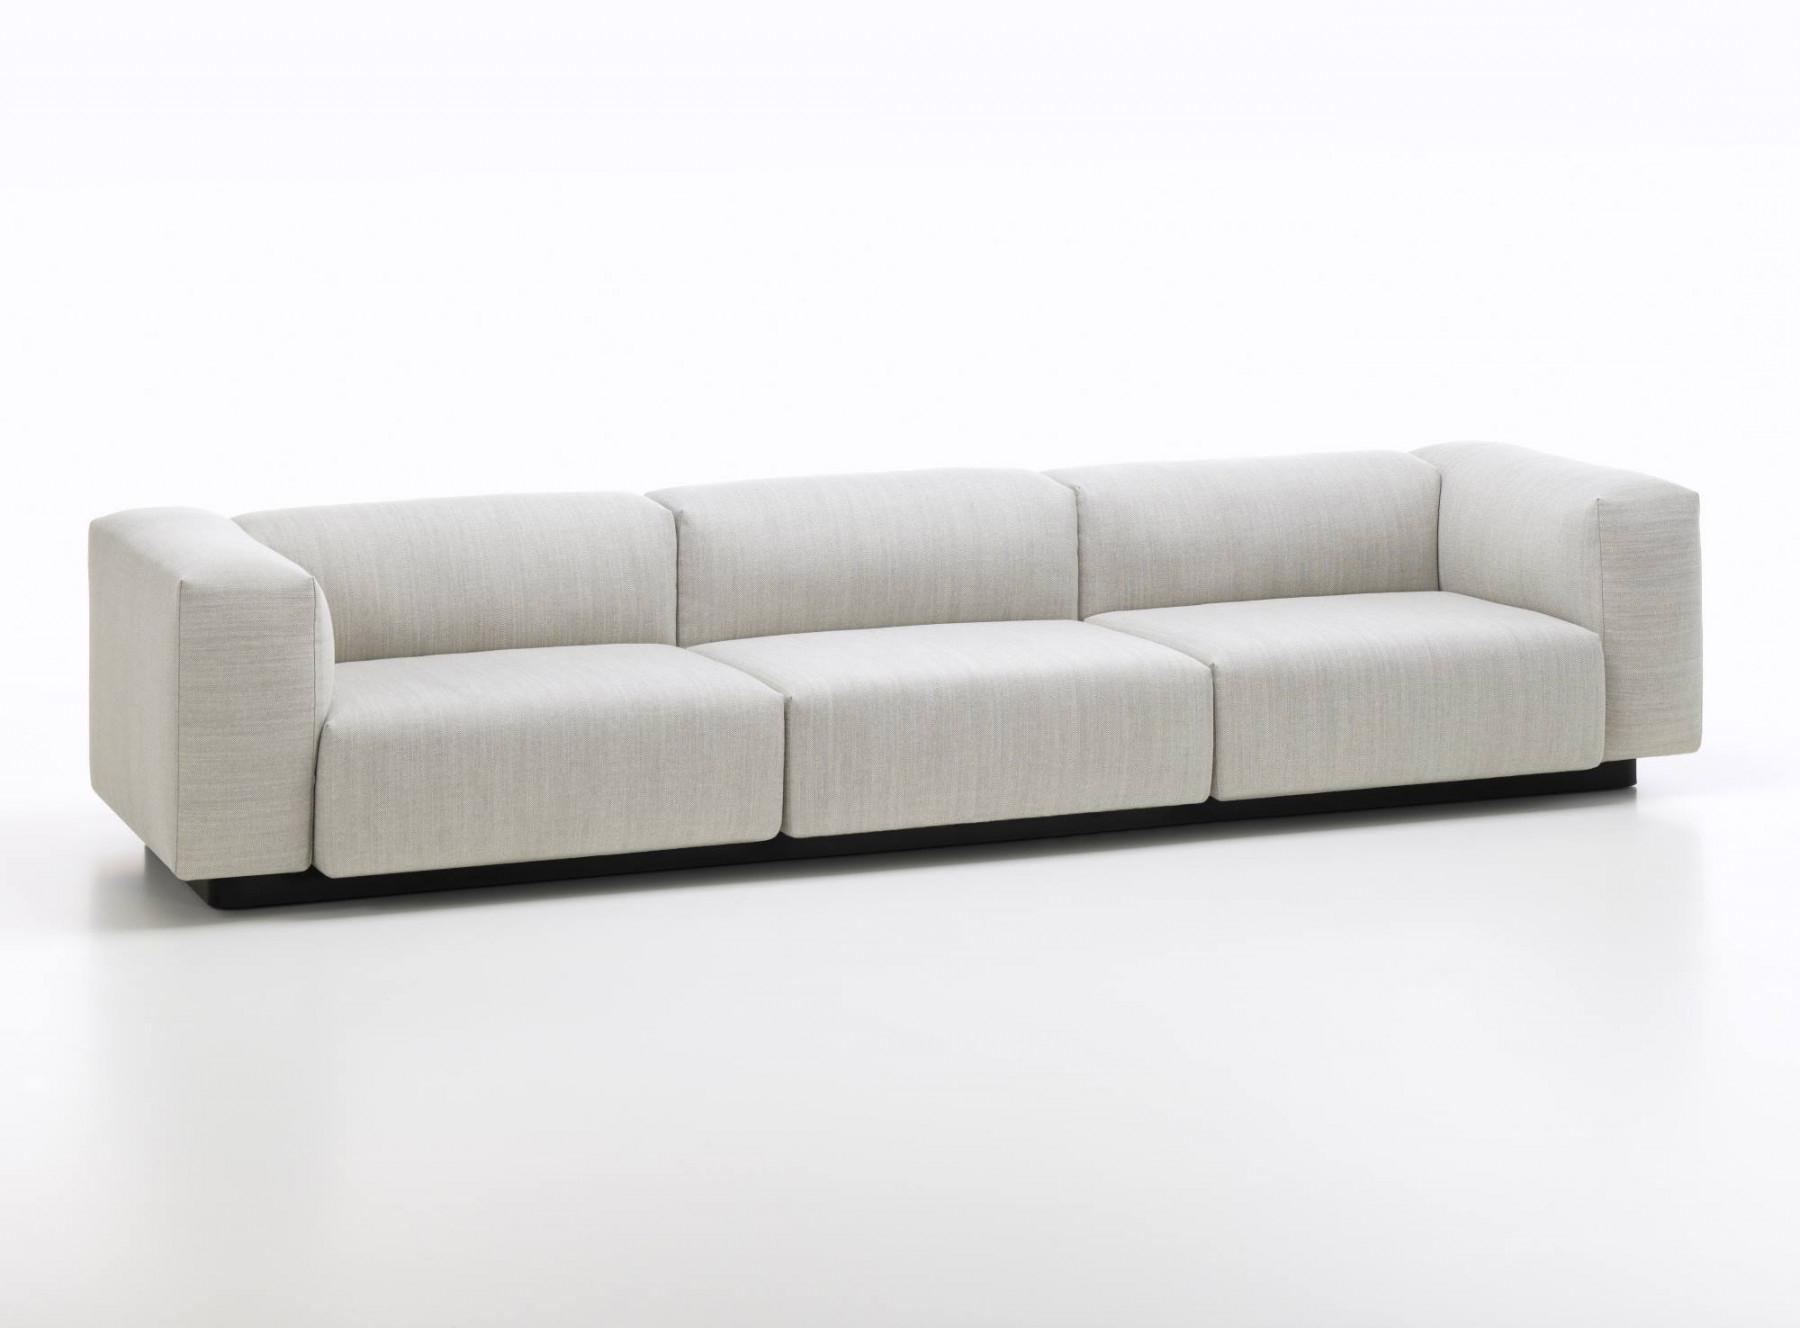 Sofa Modular Tldn soft Modular sofa Three Seater Vitra